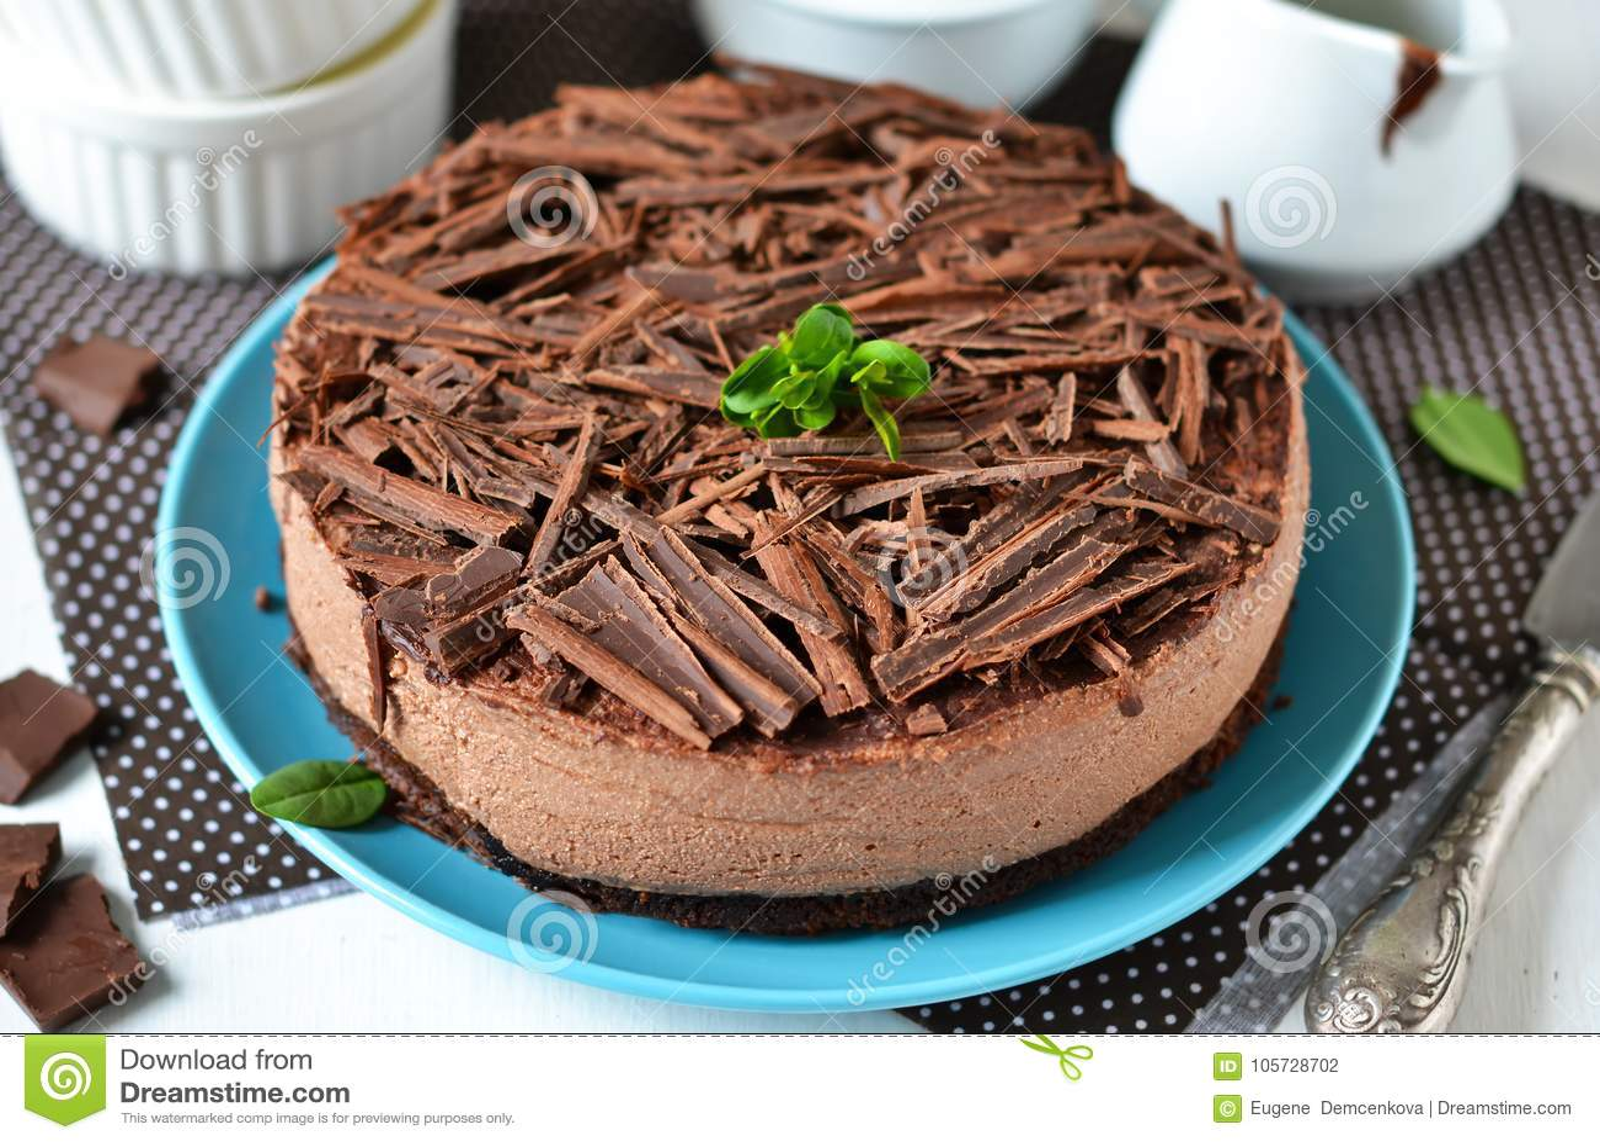 Chocolate cheesecake with mascarpone, chocolate biscuit